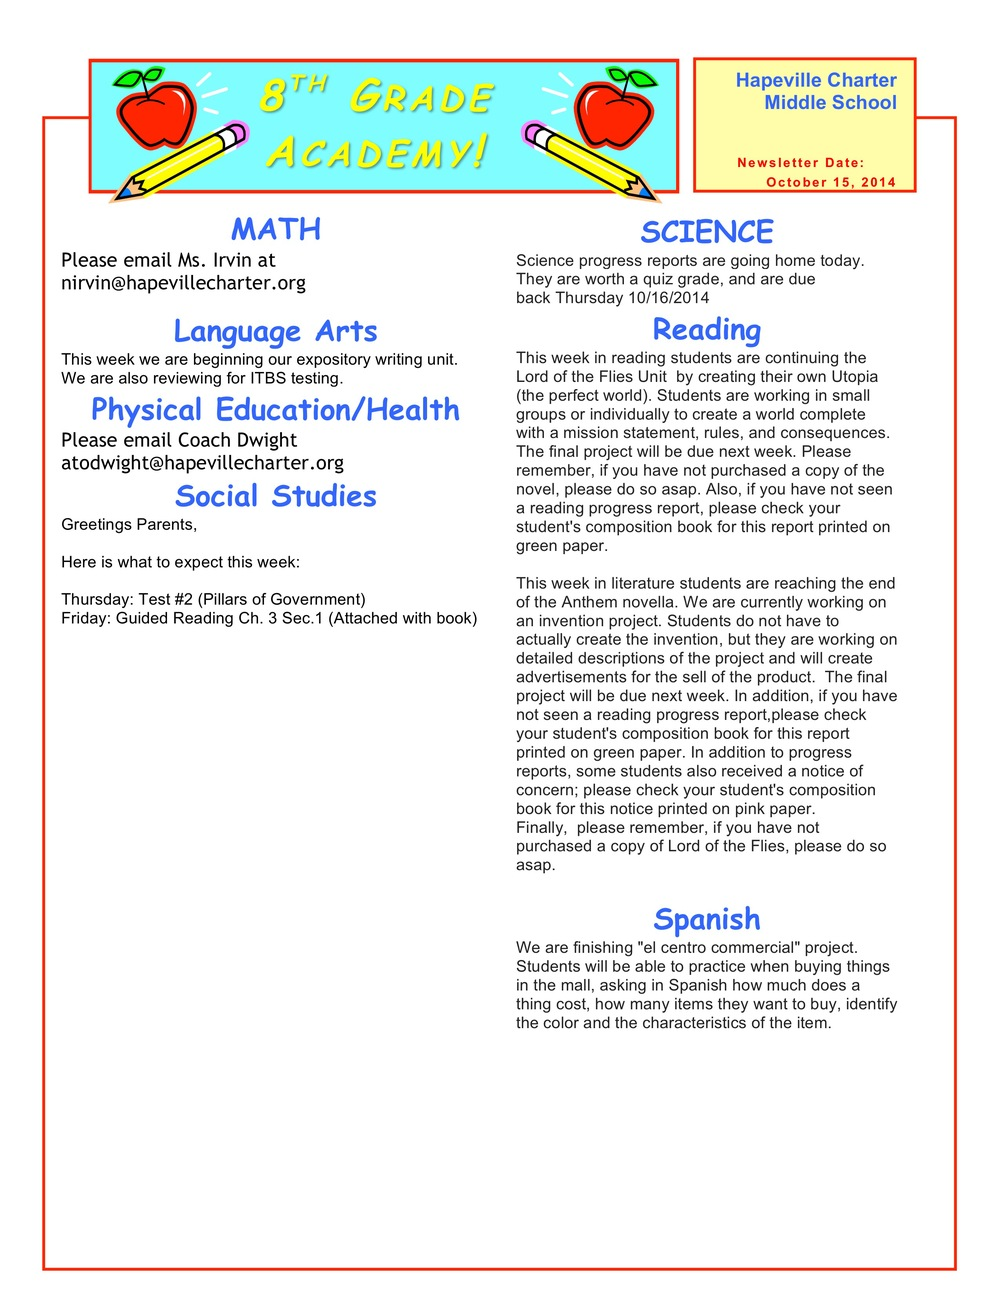 Week Of October 13 17 2014 Hapeville Charter Middle School